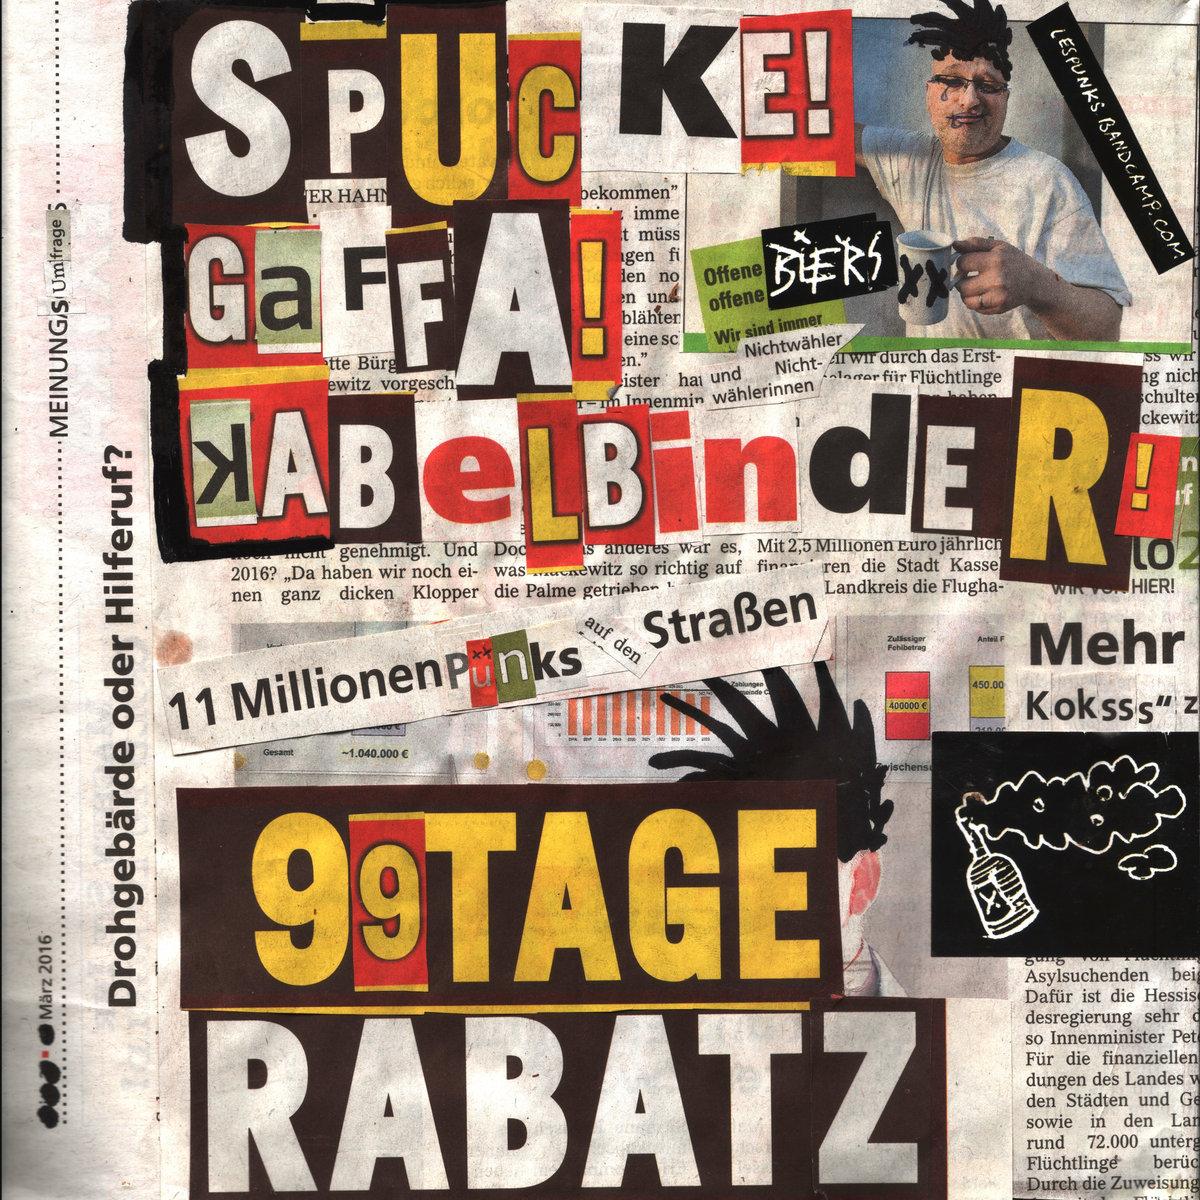 Spucke, Gaffa, Kabelbinder | lés pünks